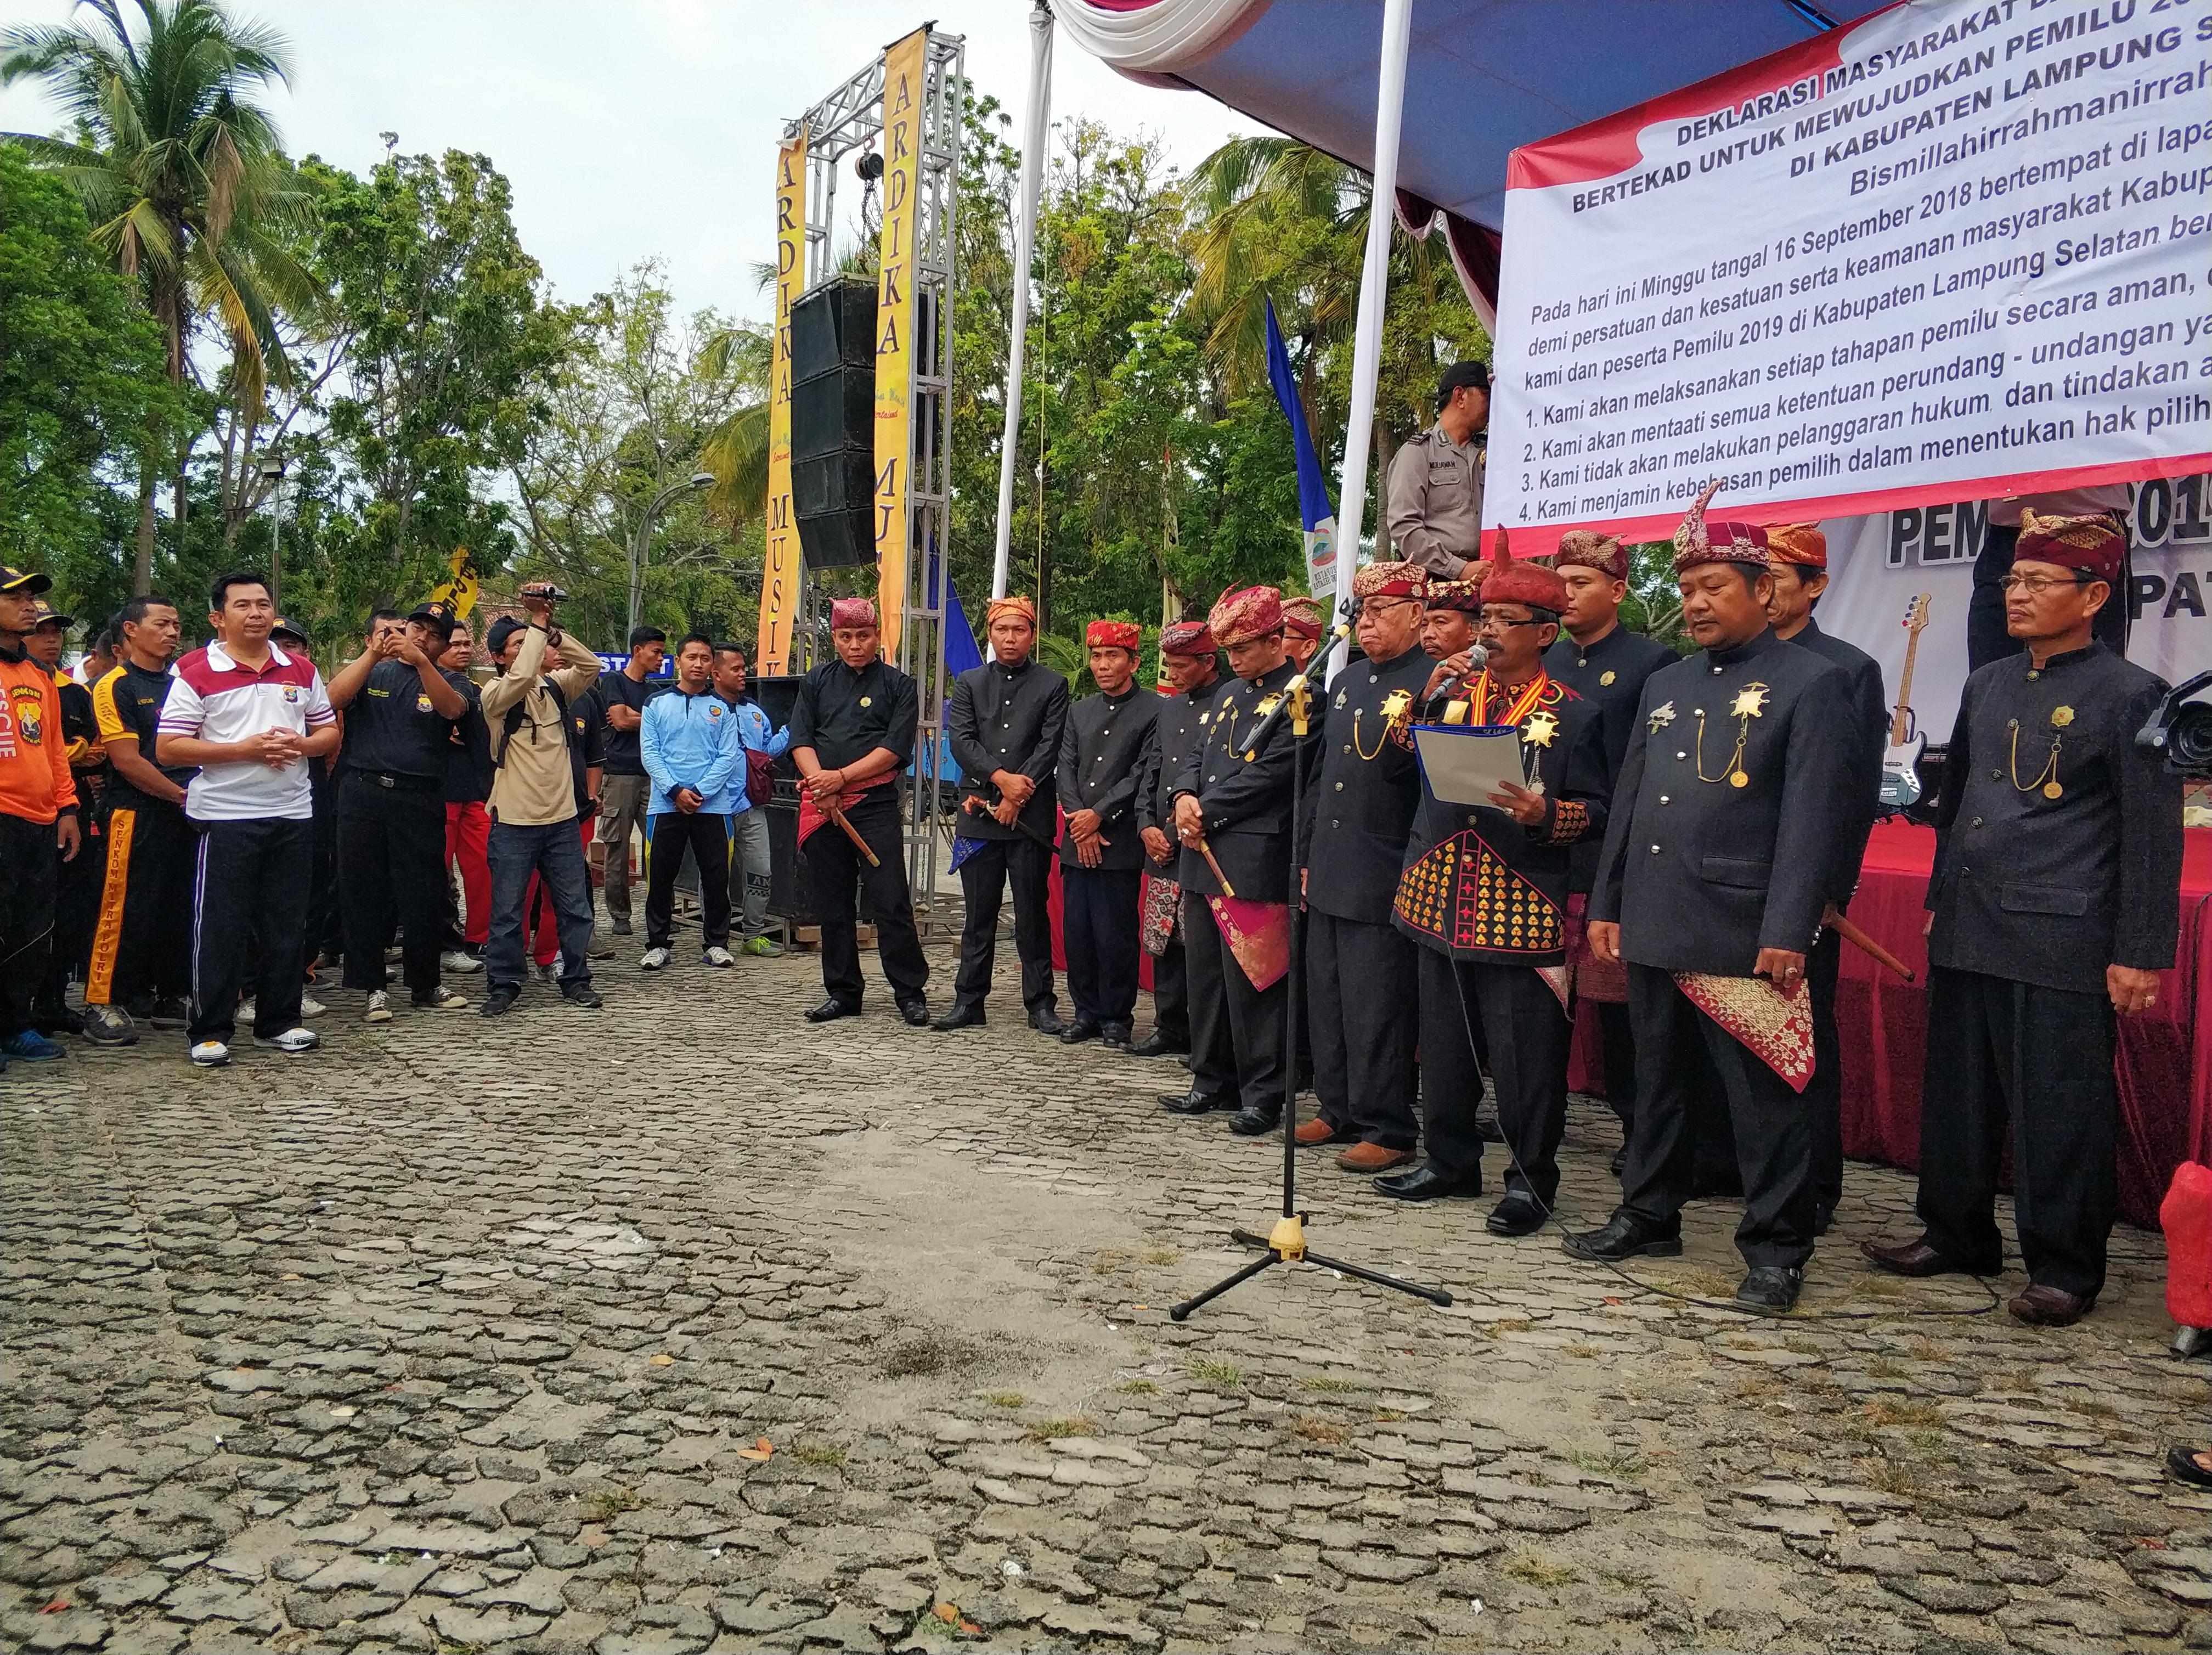 IMG_20180916_080304_1 Polres Lamsel Gelar Deklarasi Damai Bersama Pemkab Beserta Seluruh Elemen Parpol & Masyarakat